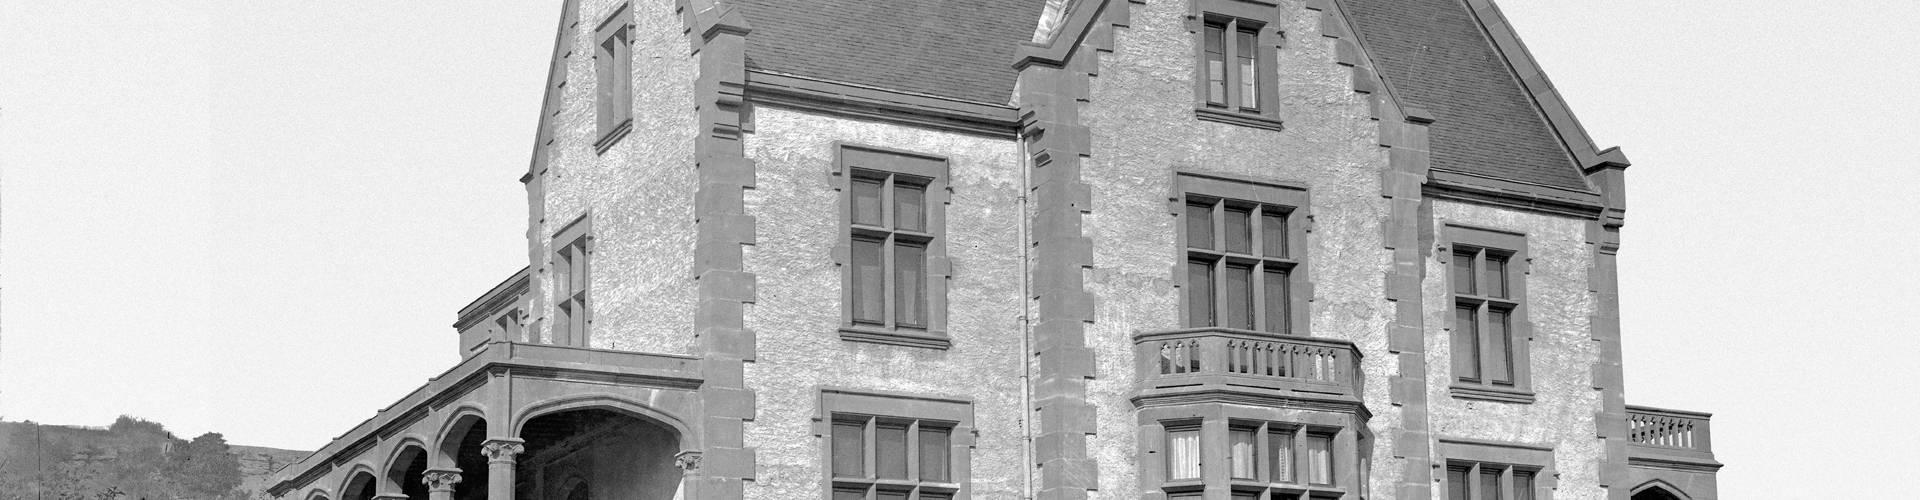 henri tudor museum rosport outside